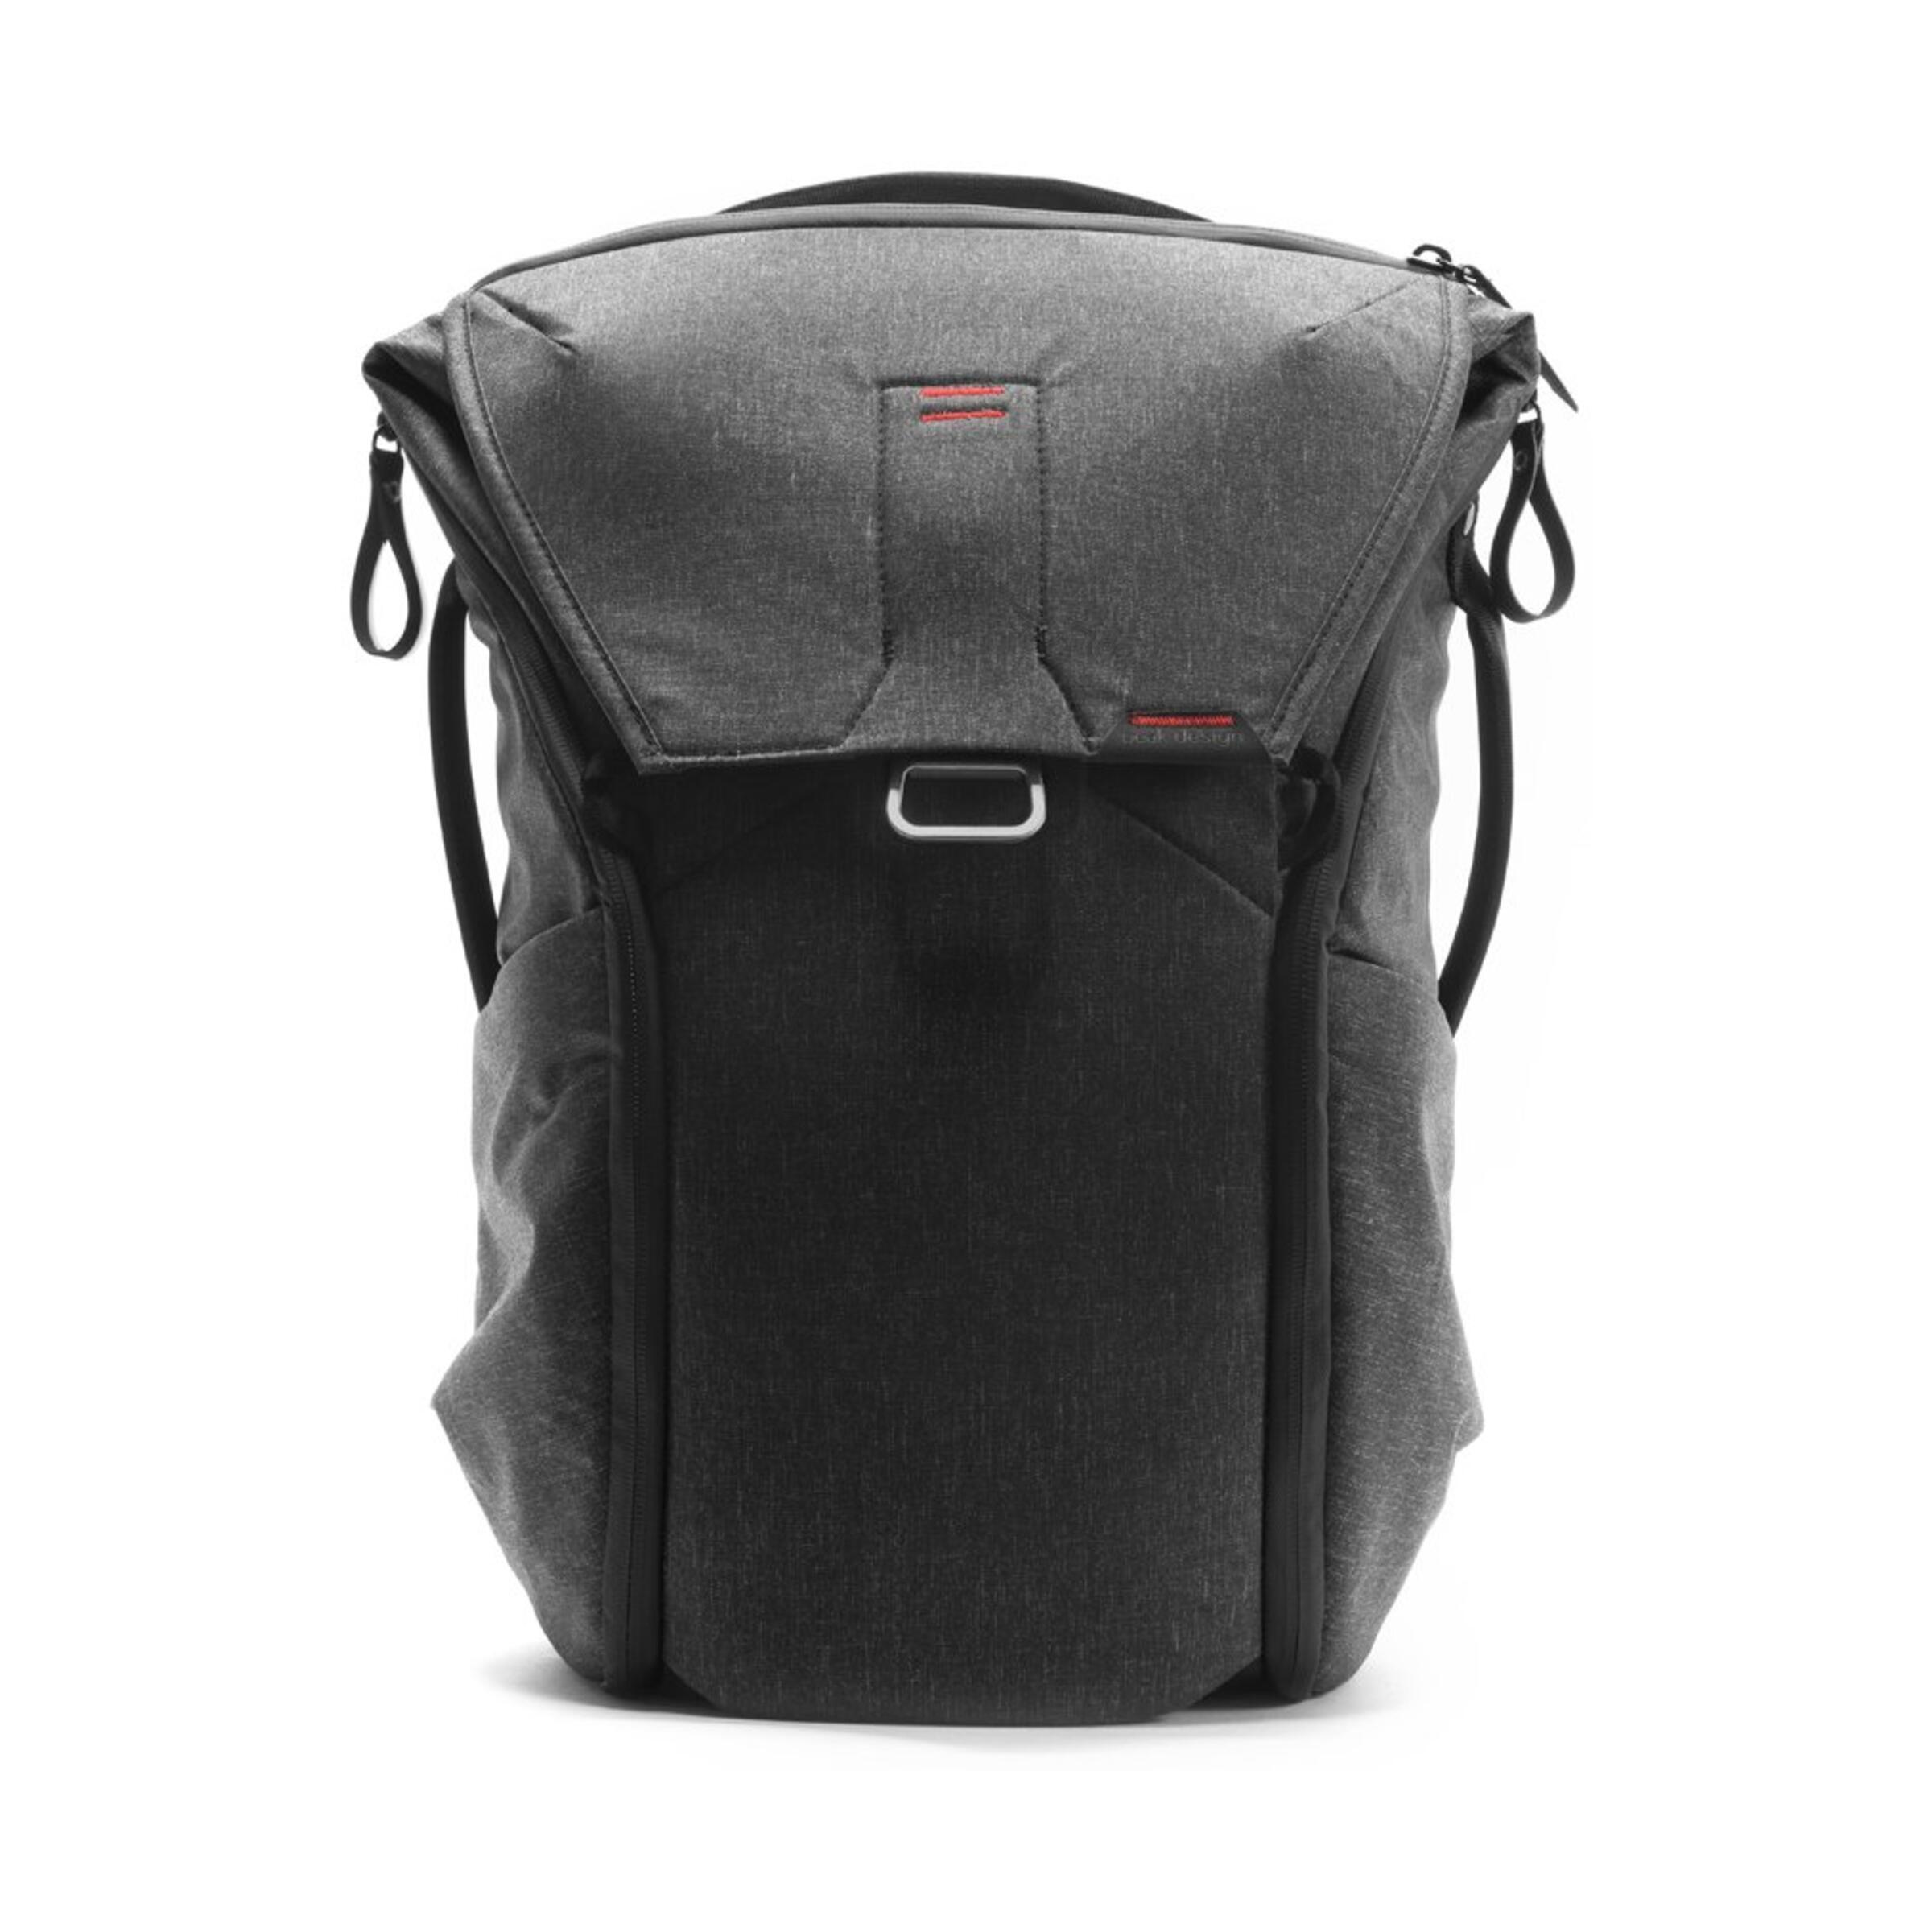 Peak Design Everyday Backpack 20L : Charcoal